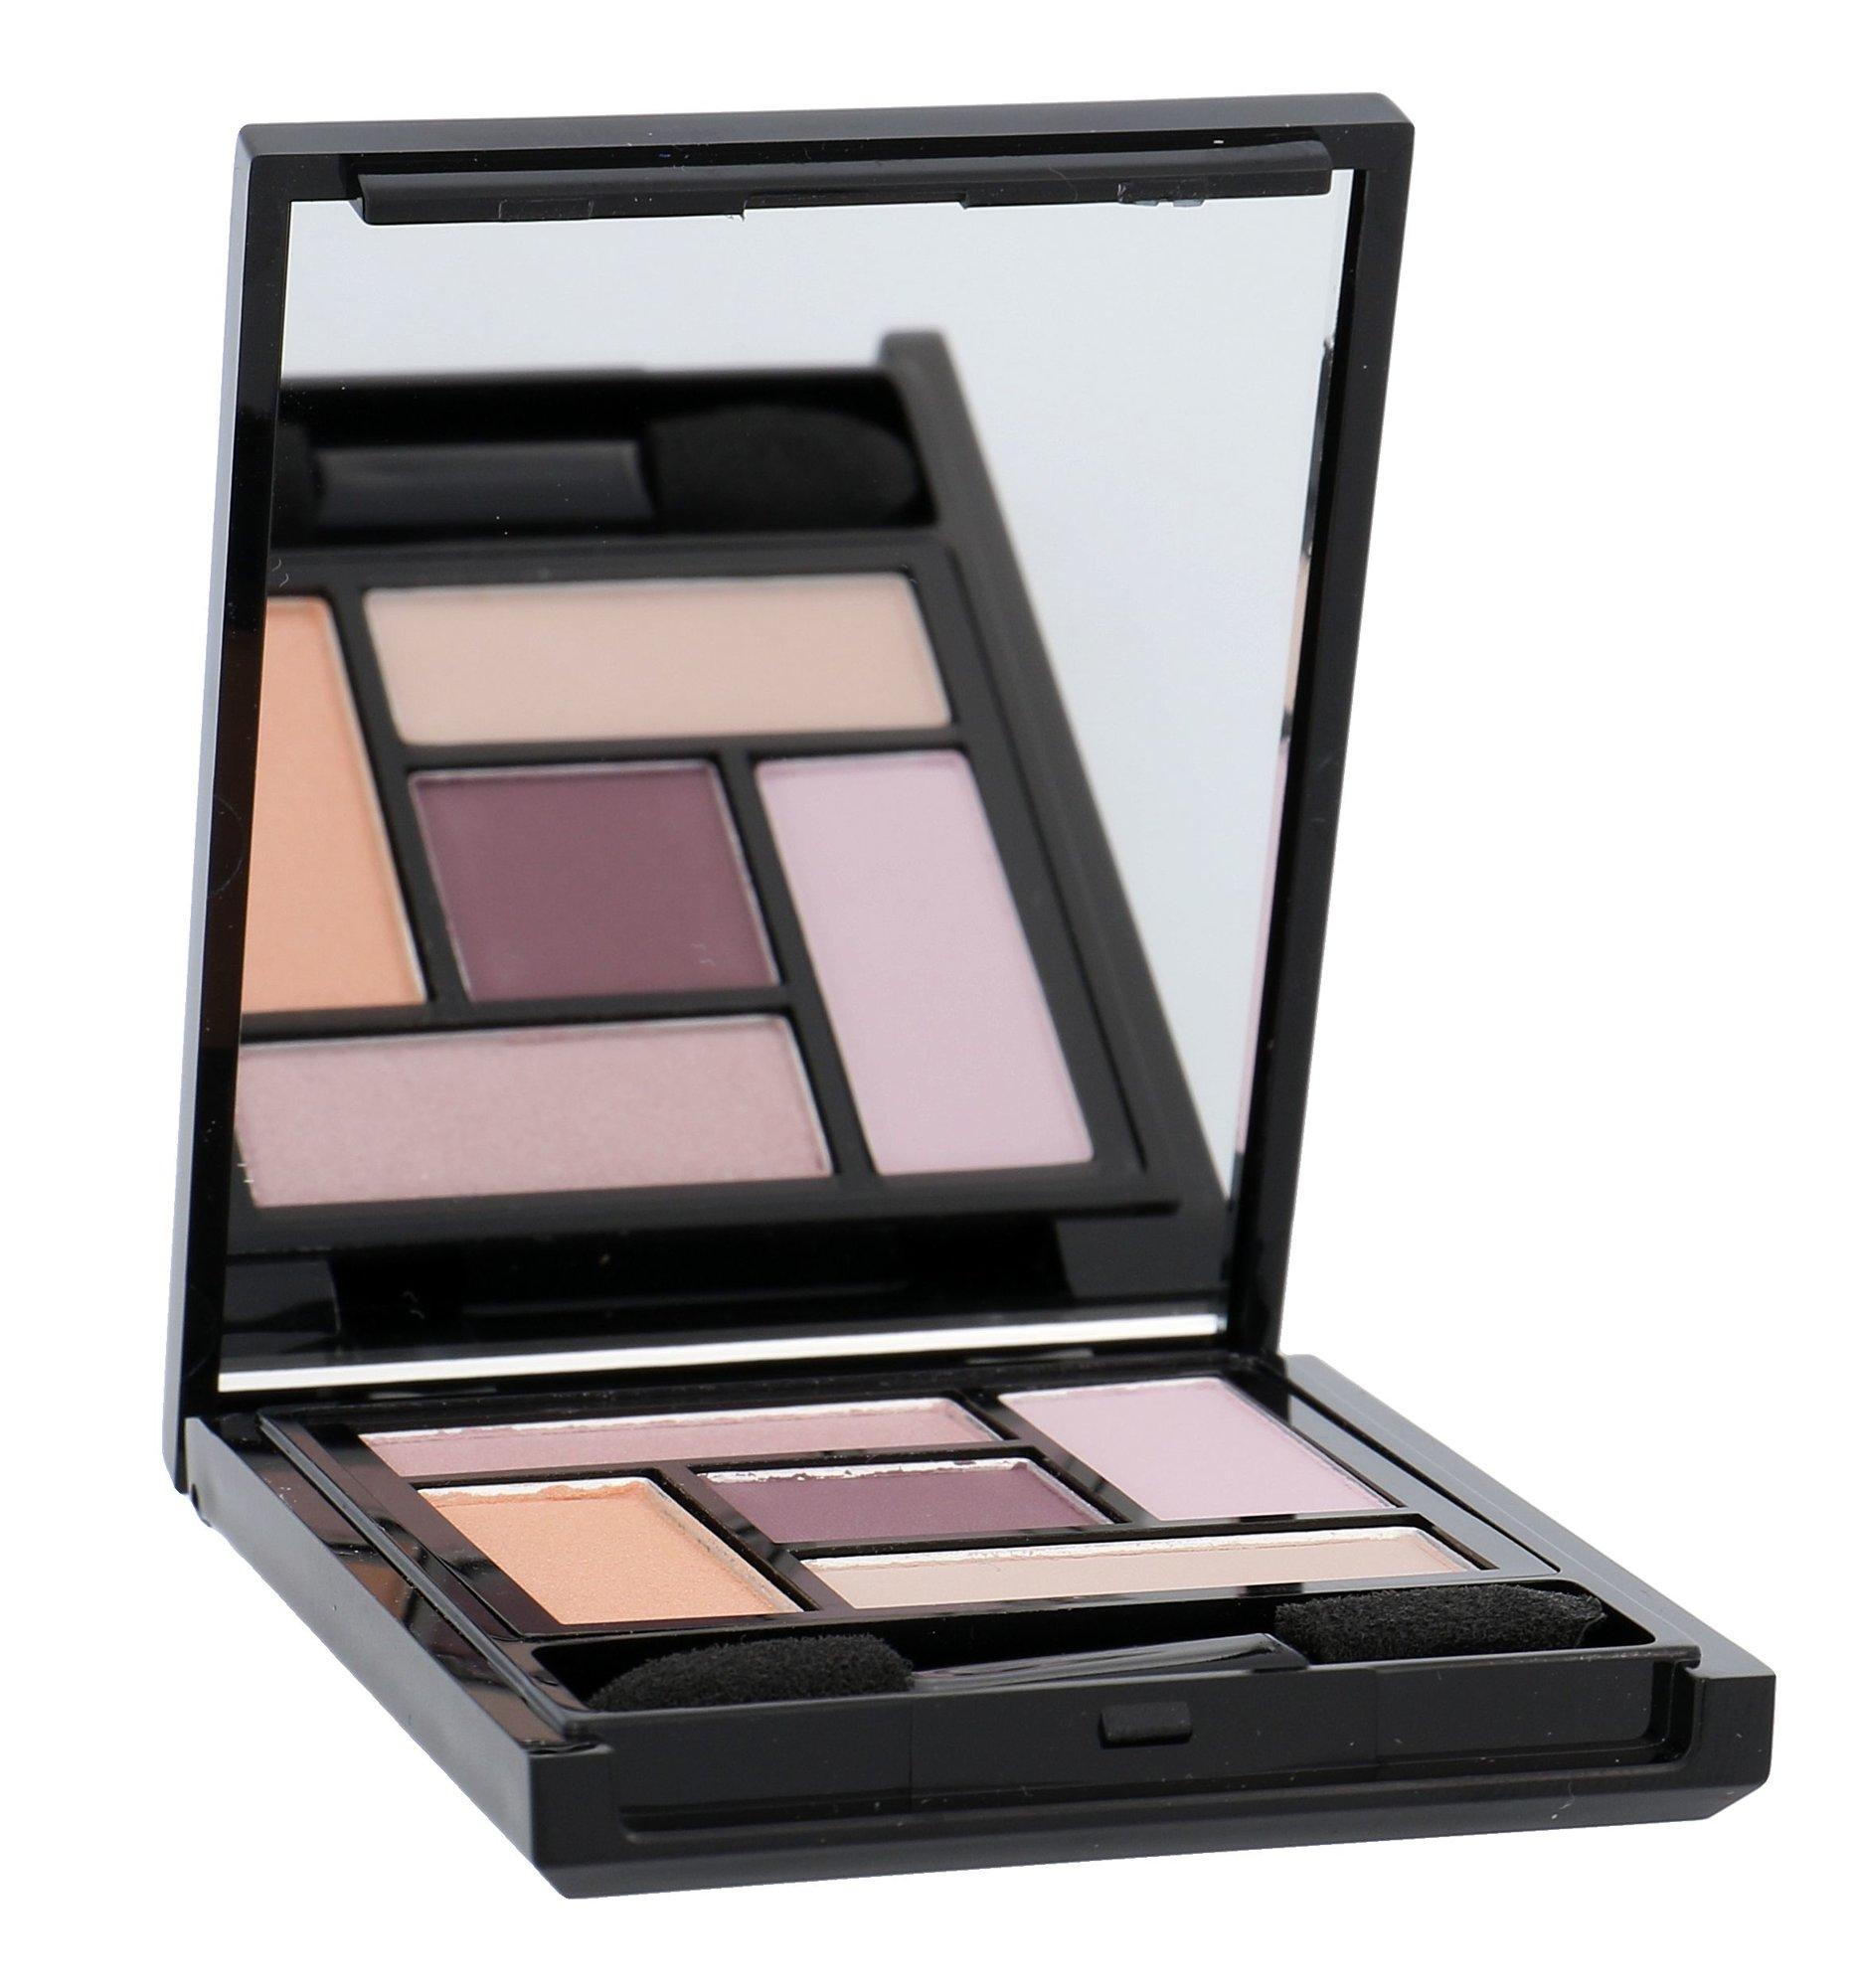 Makeup Trading In Love Eyeshadow Palette Cosmetic 4g